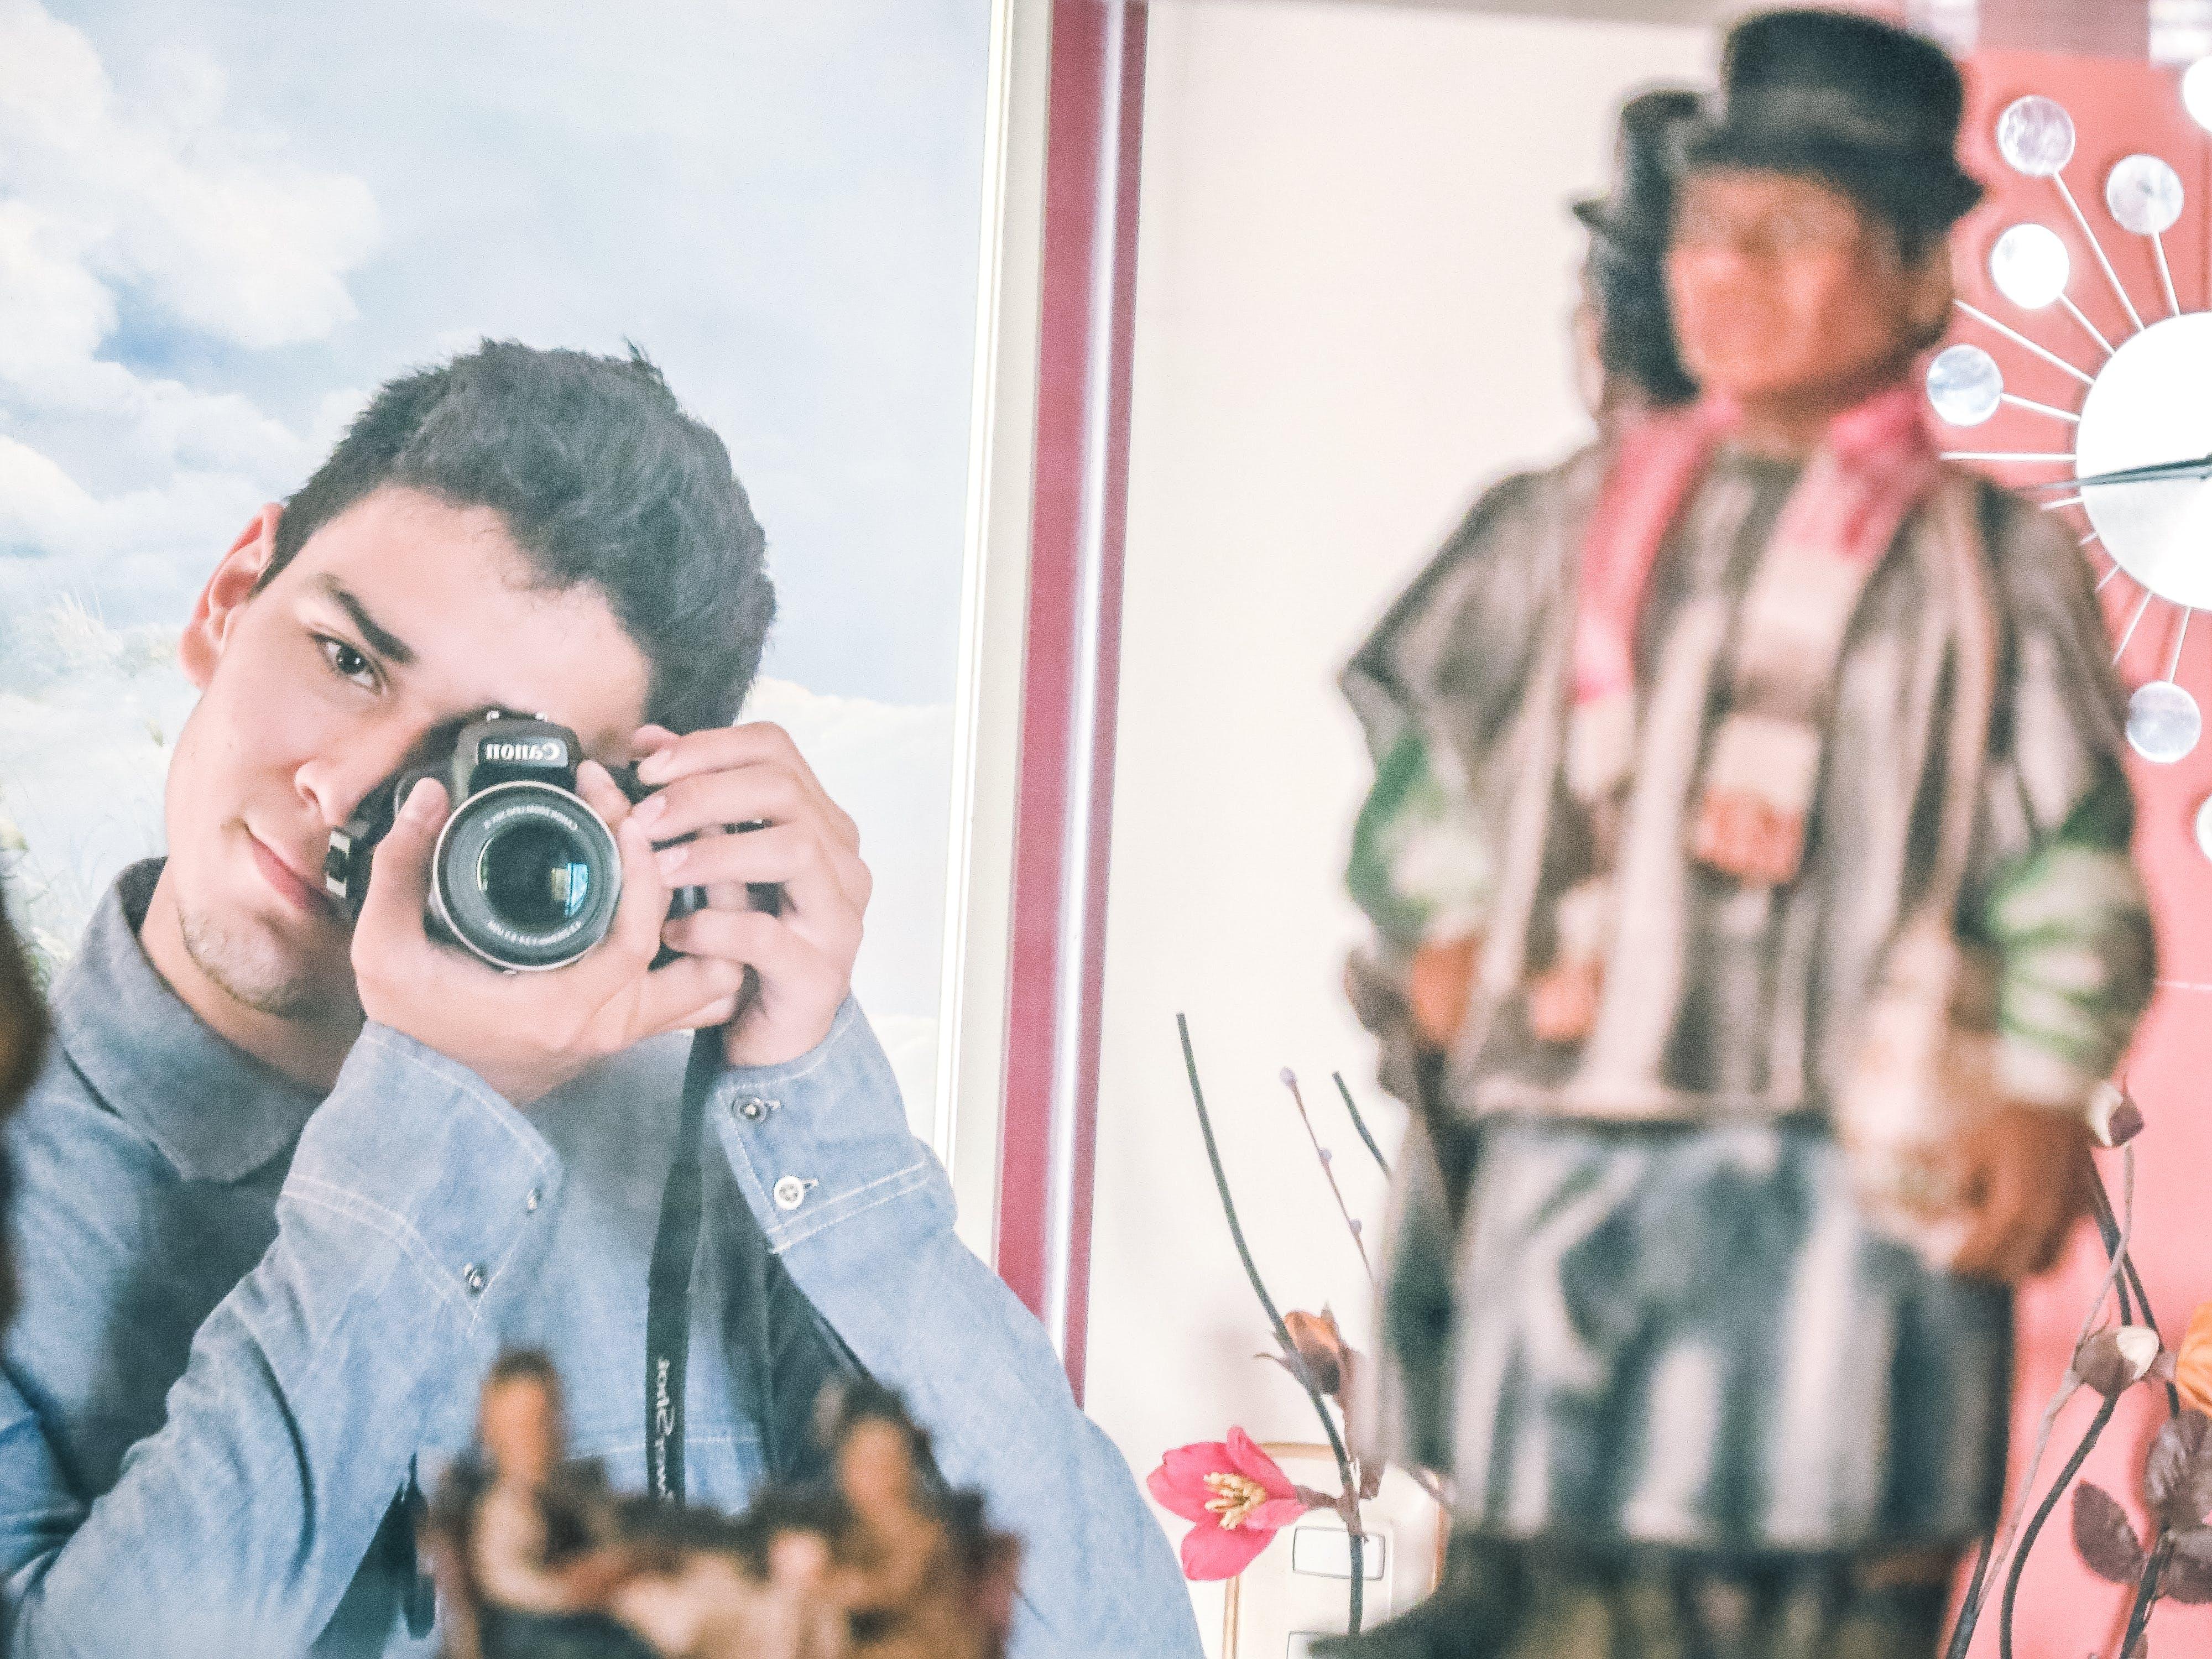 Gratis arkivbilde med canon, digitalt speilreflekskamera, fotograf, fotografi